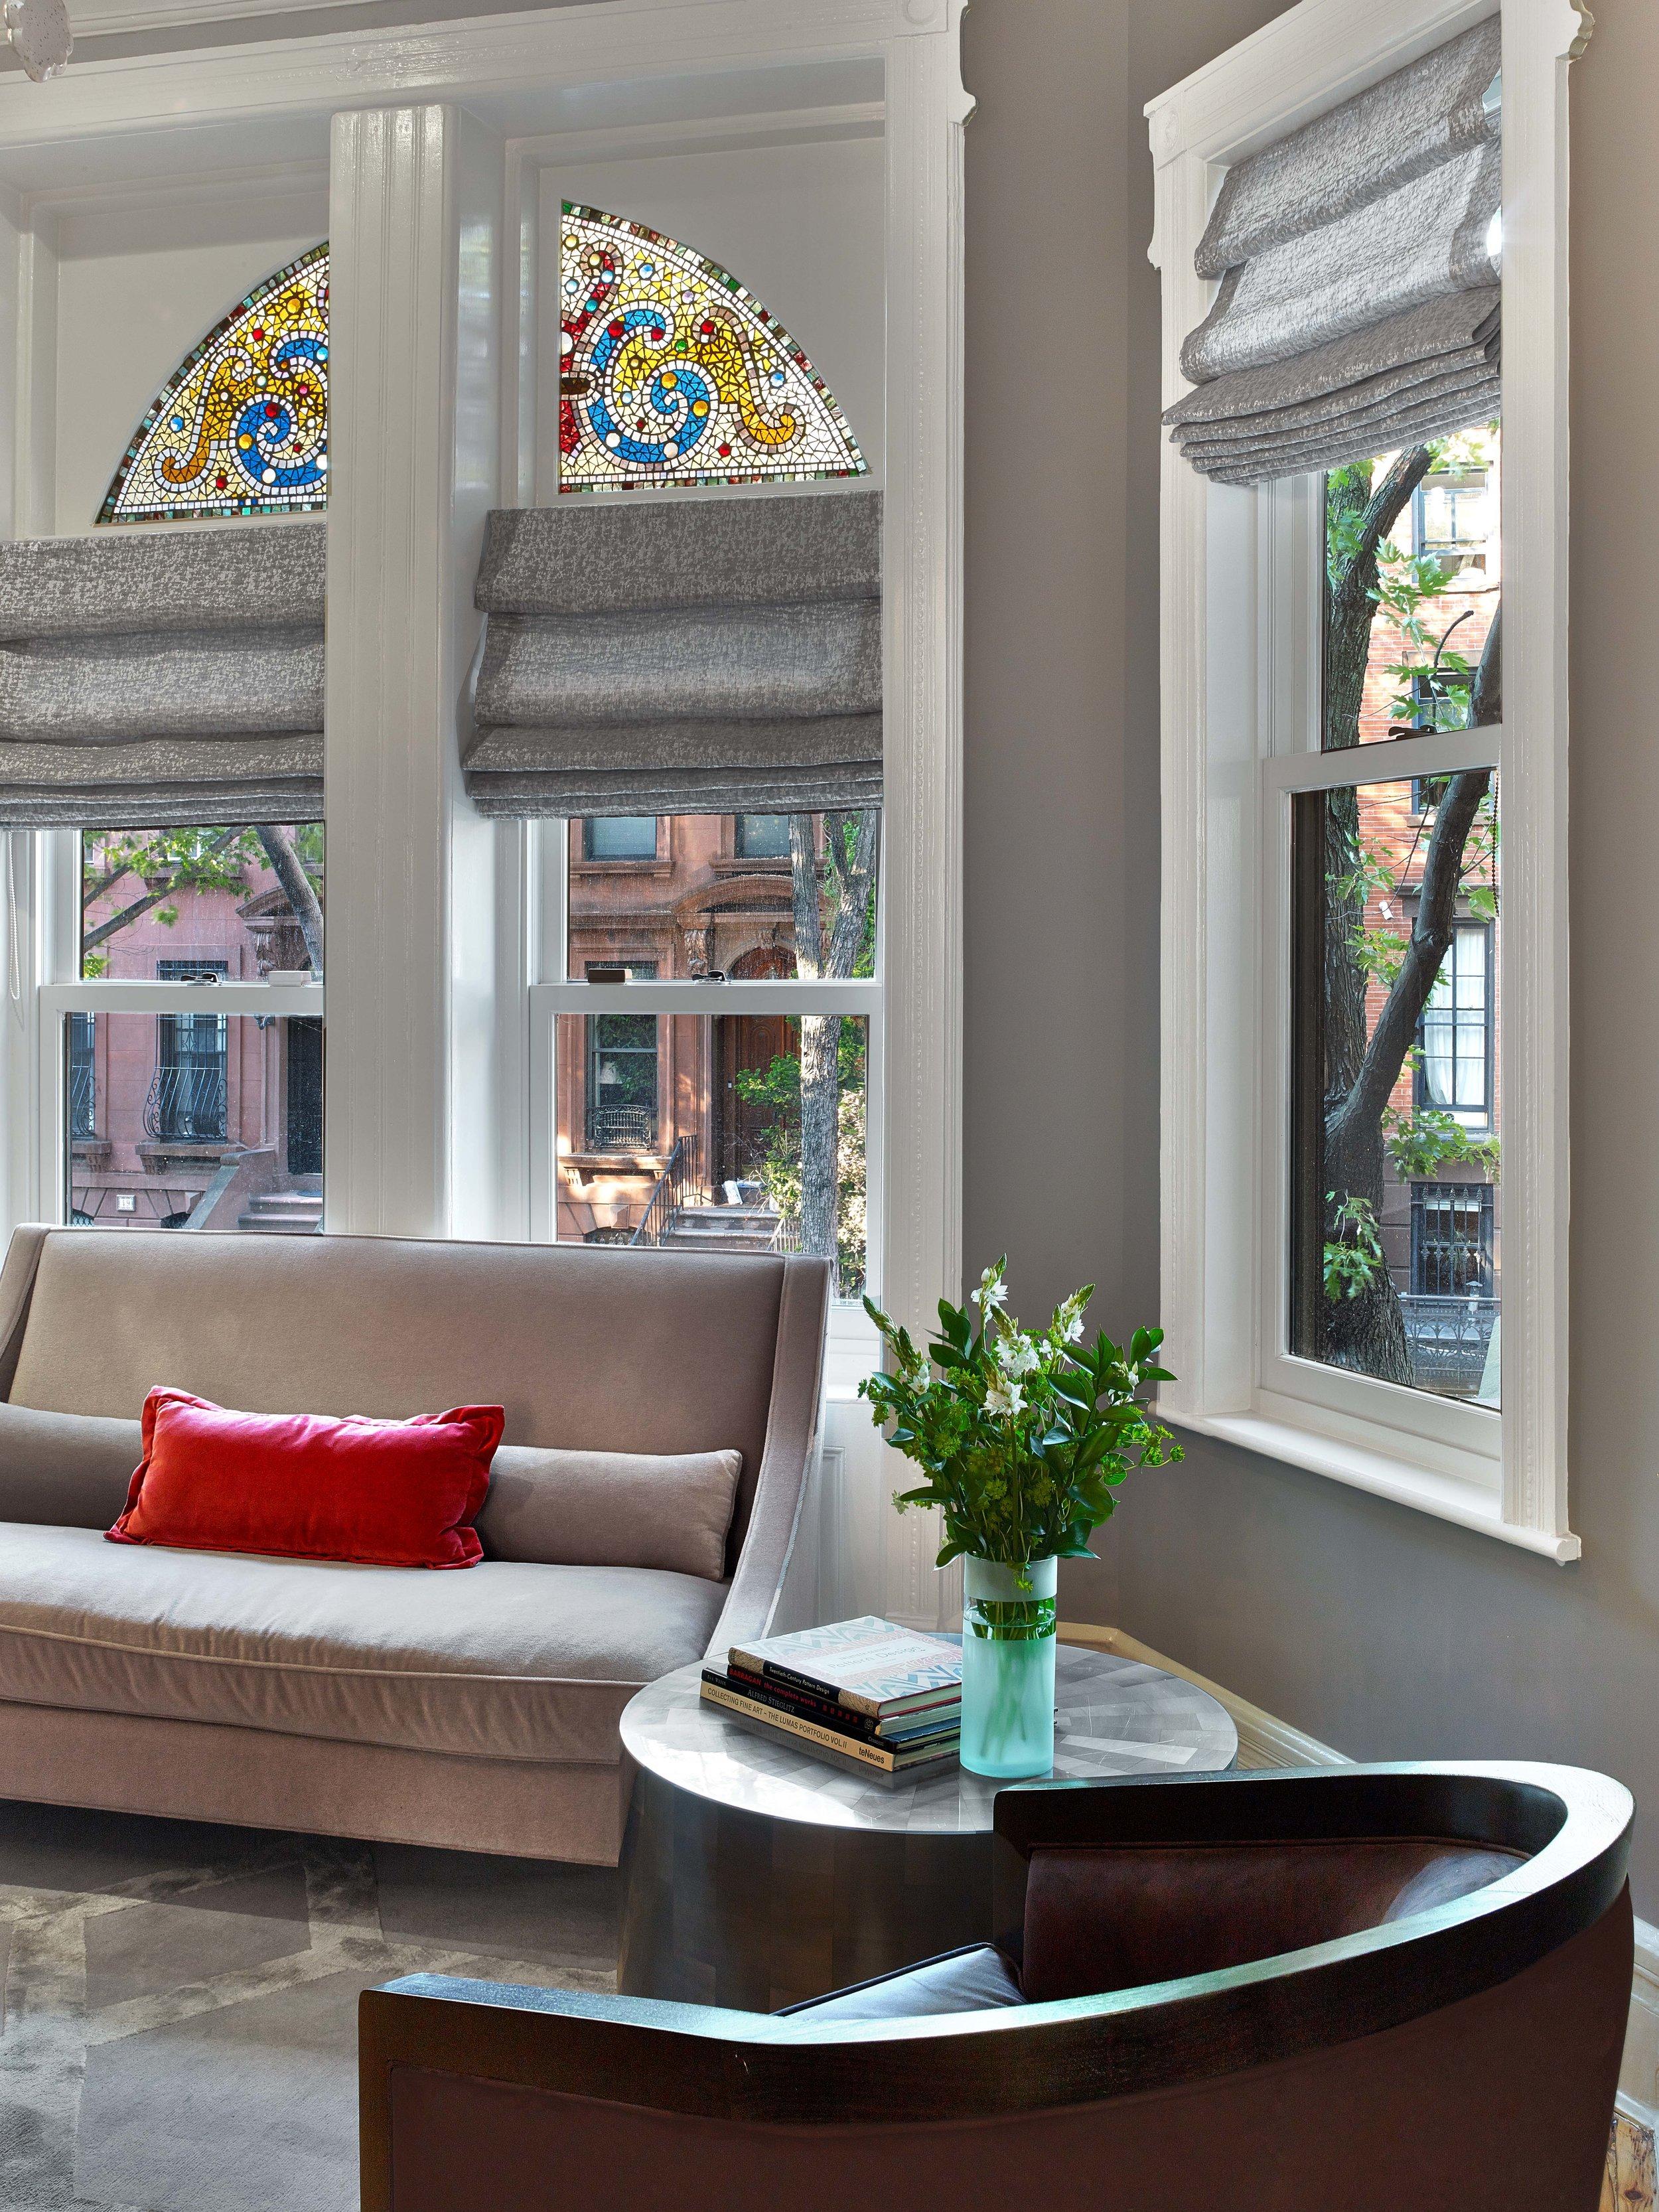 Stained-Glass-Window-Living-Room-Online-JMorris-Design-Brooklyn.jpg